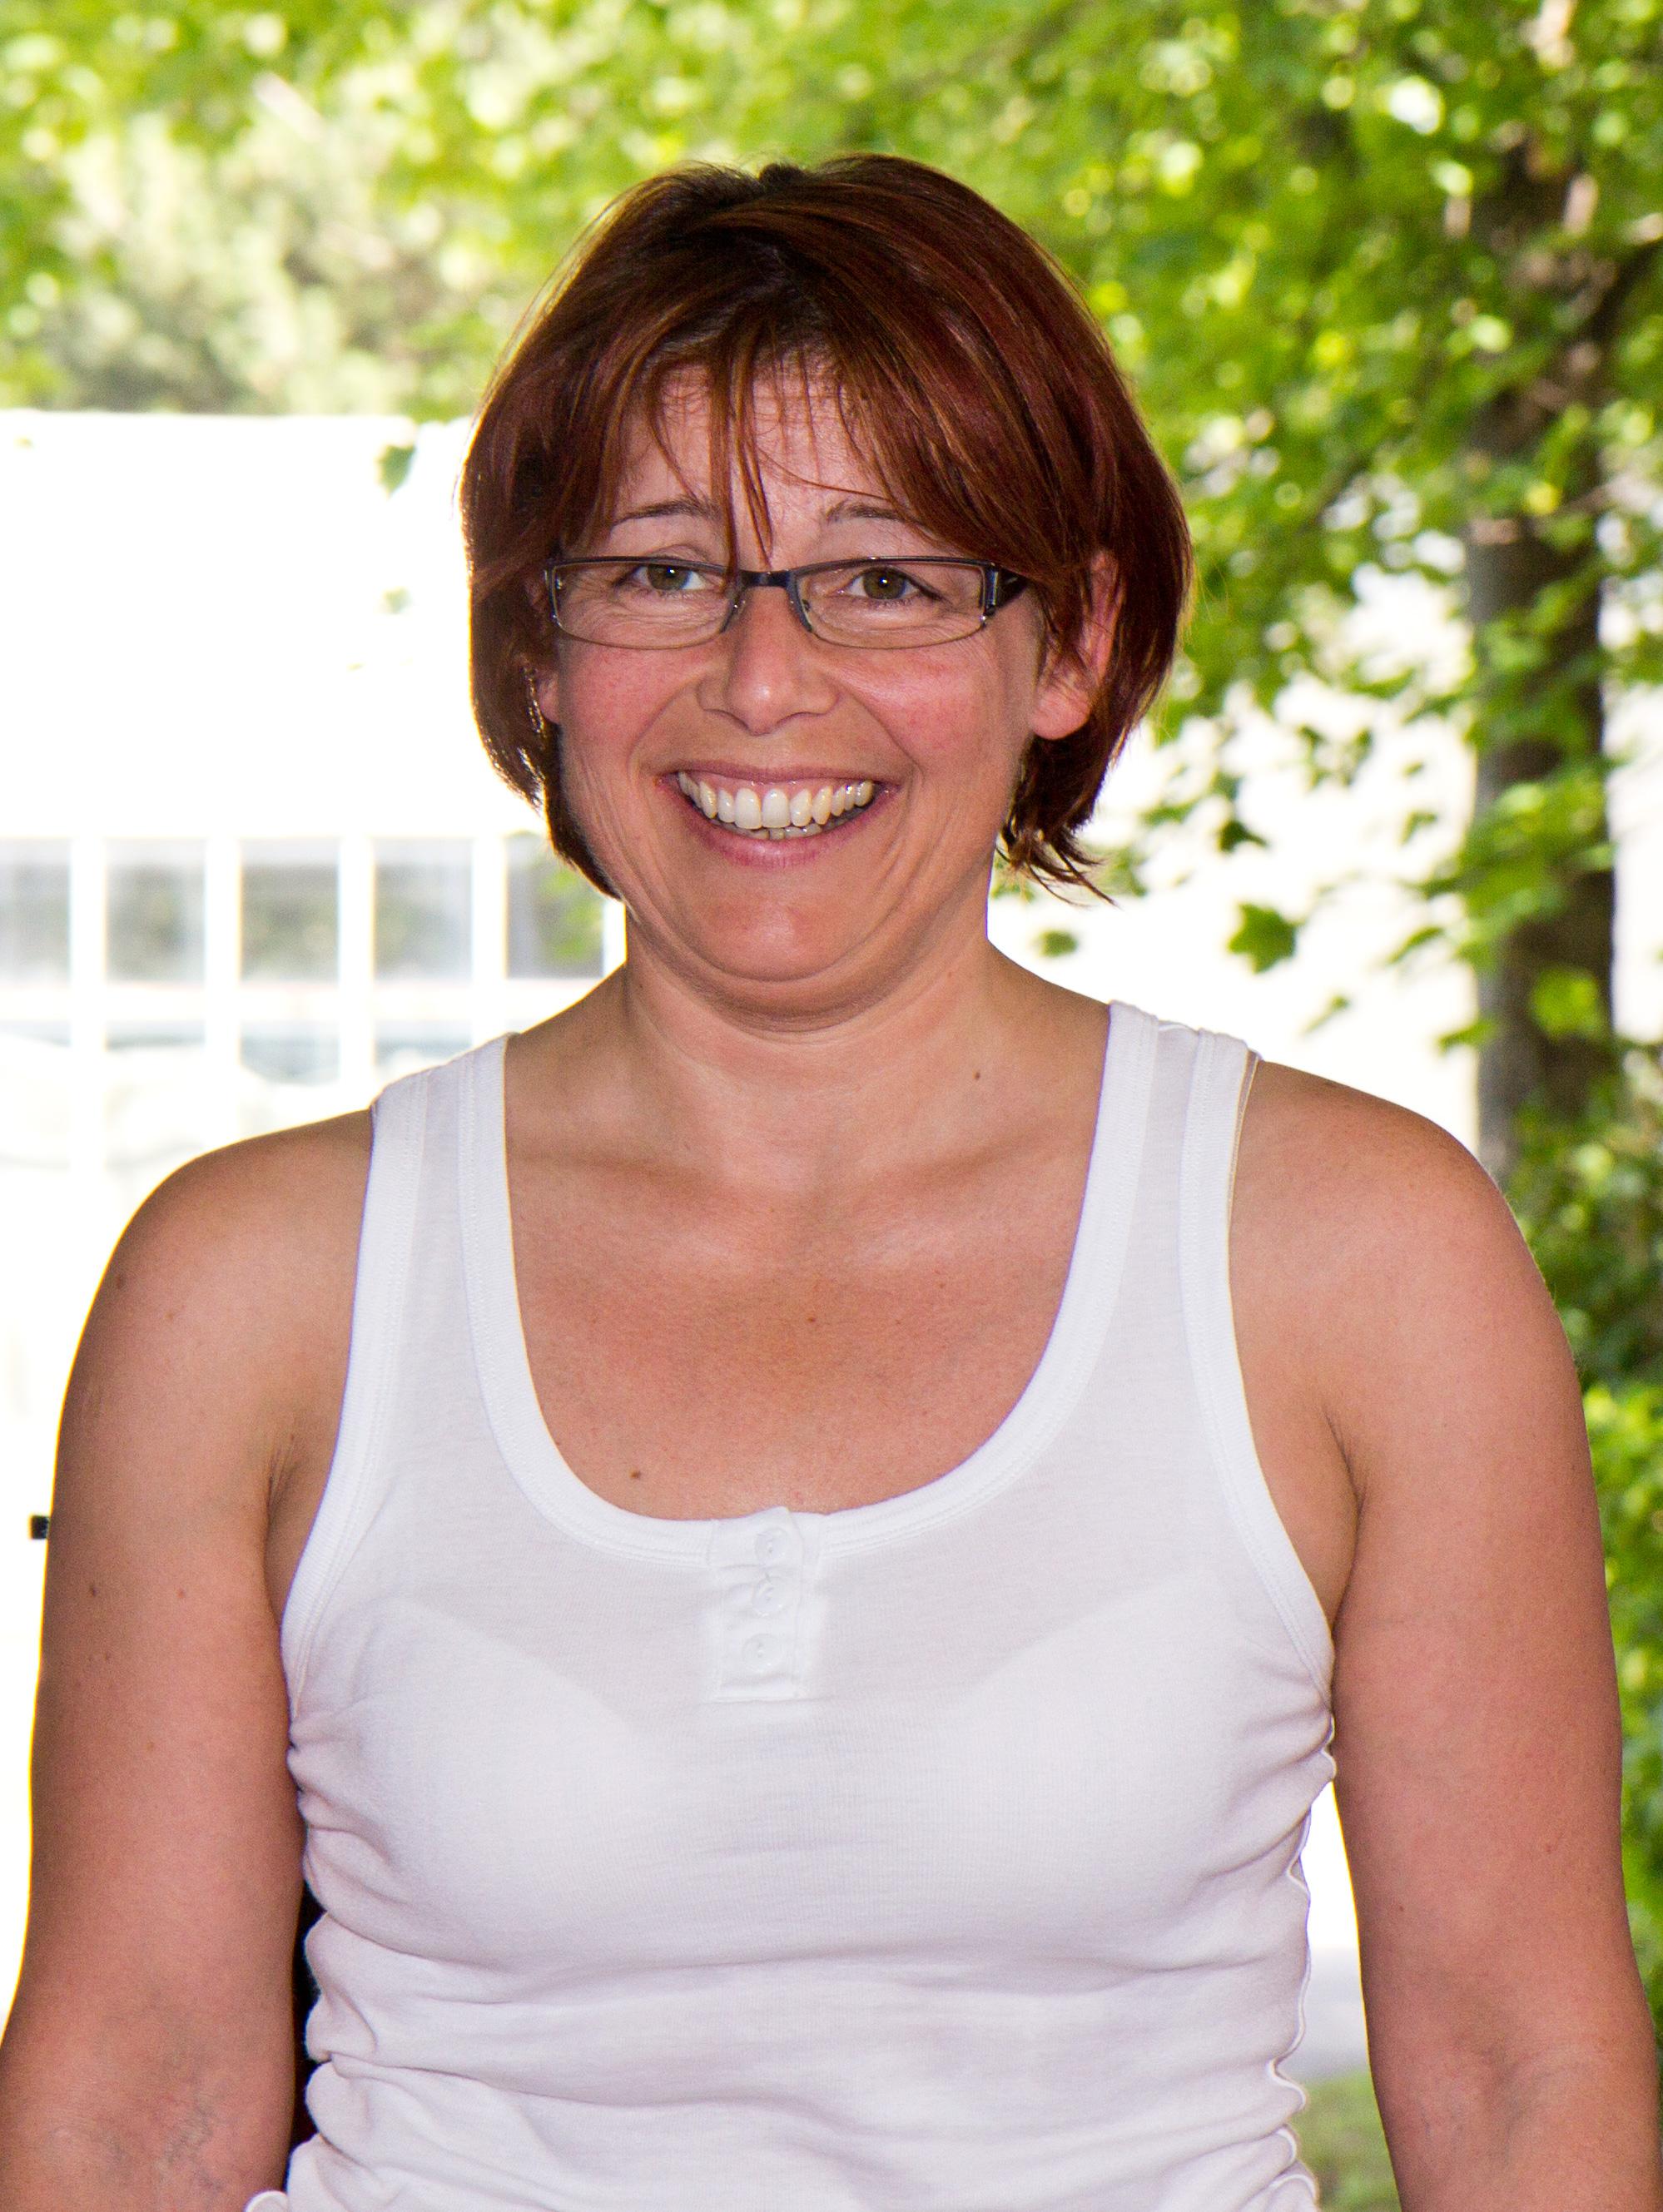 Sonja Chadt - Bilder, News, Infos aus dem Web